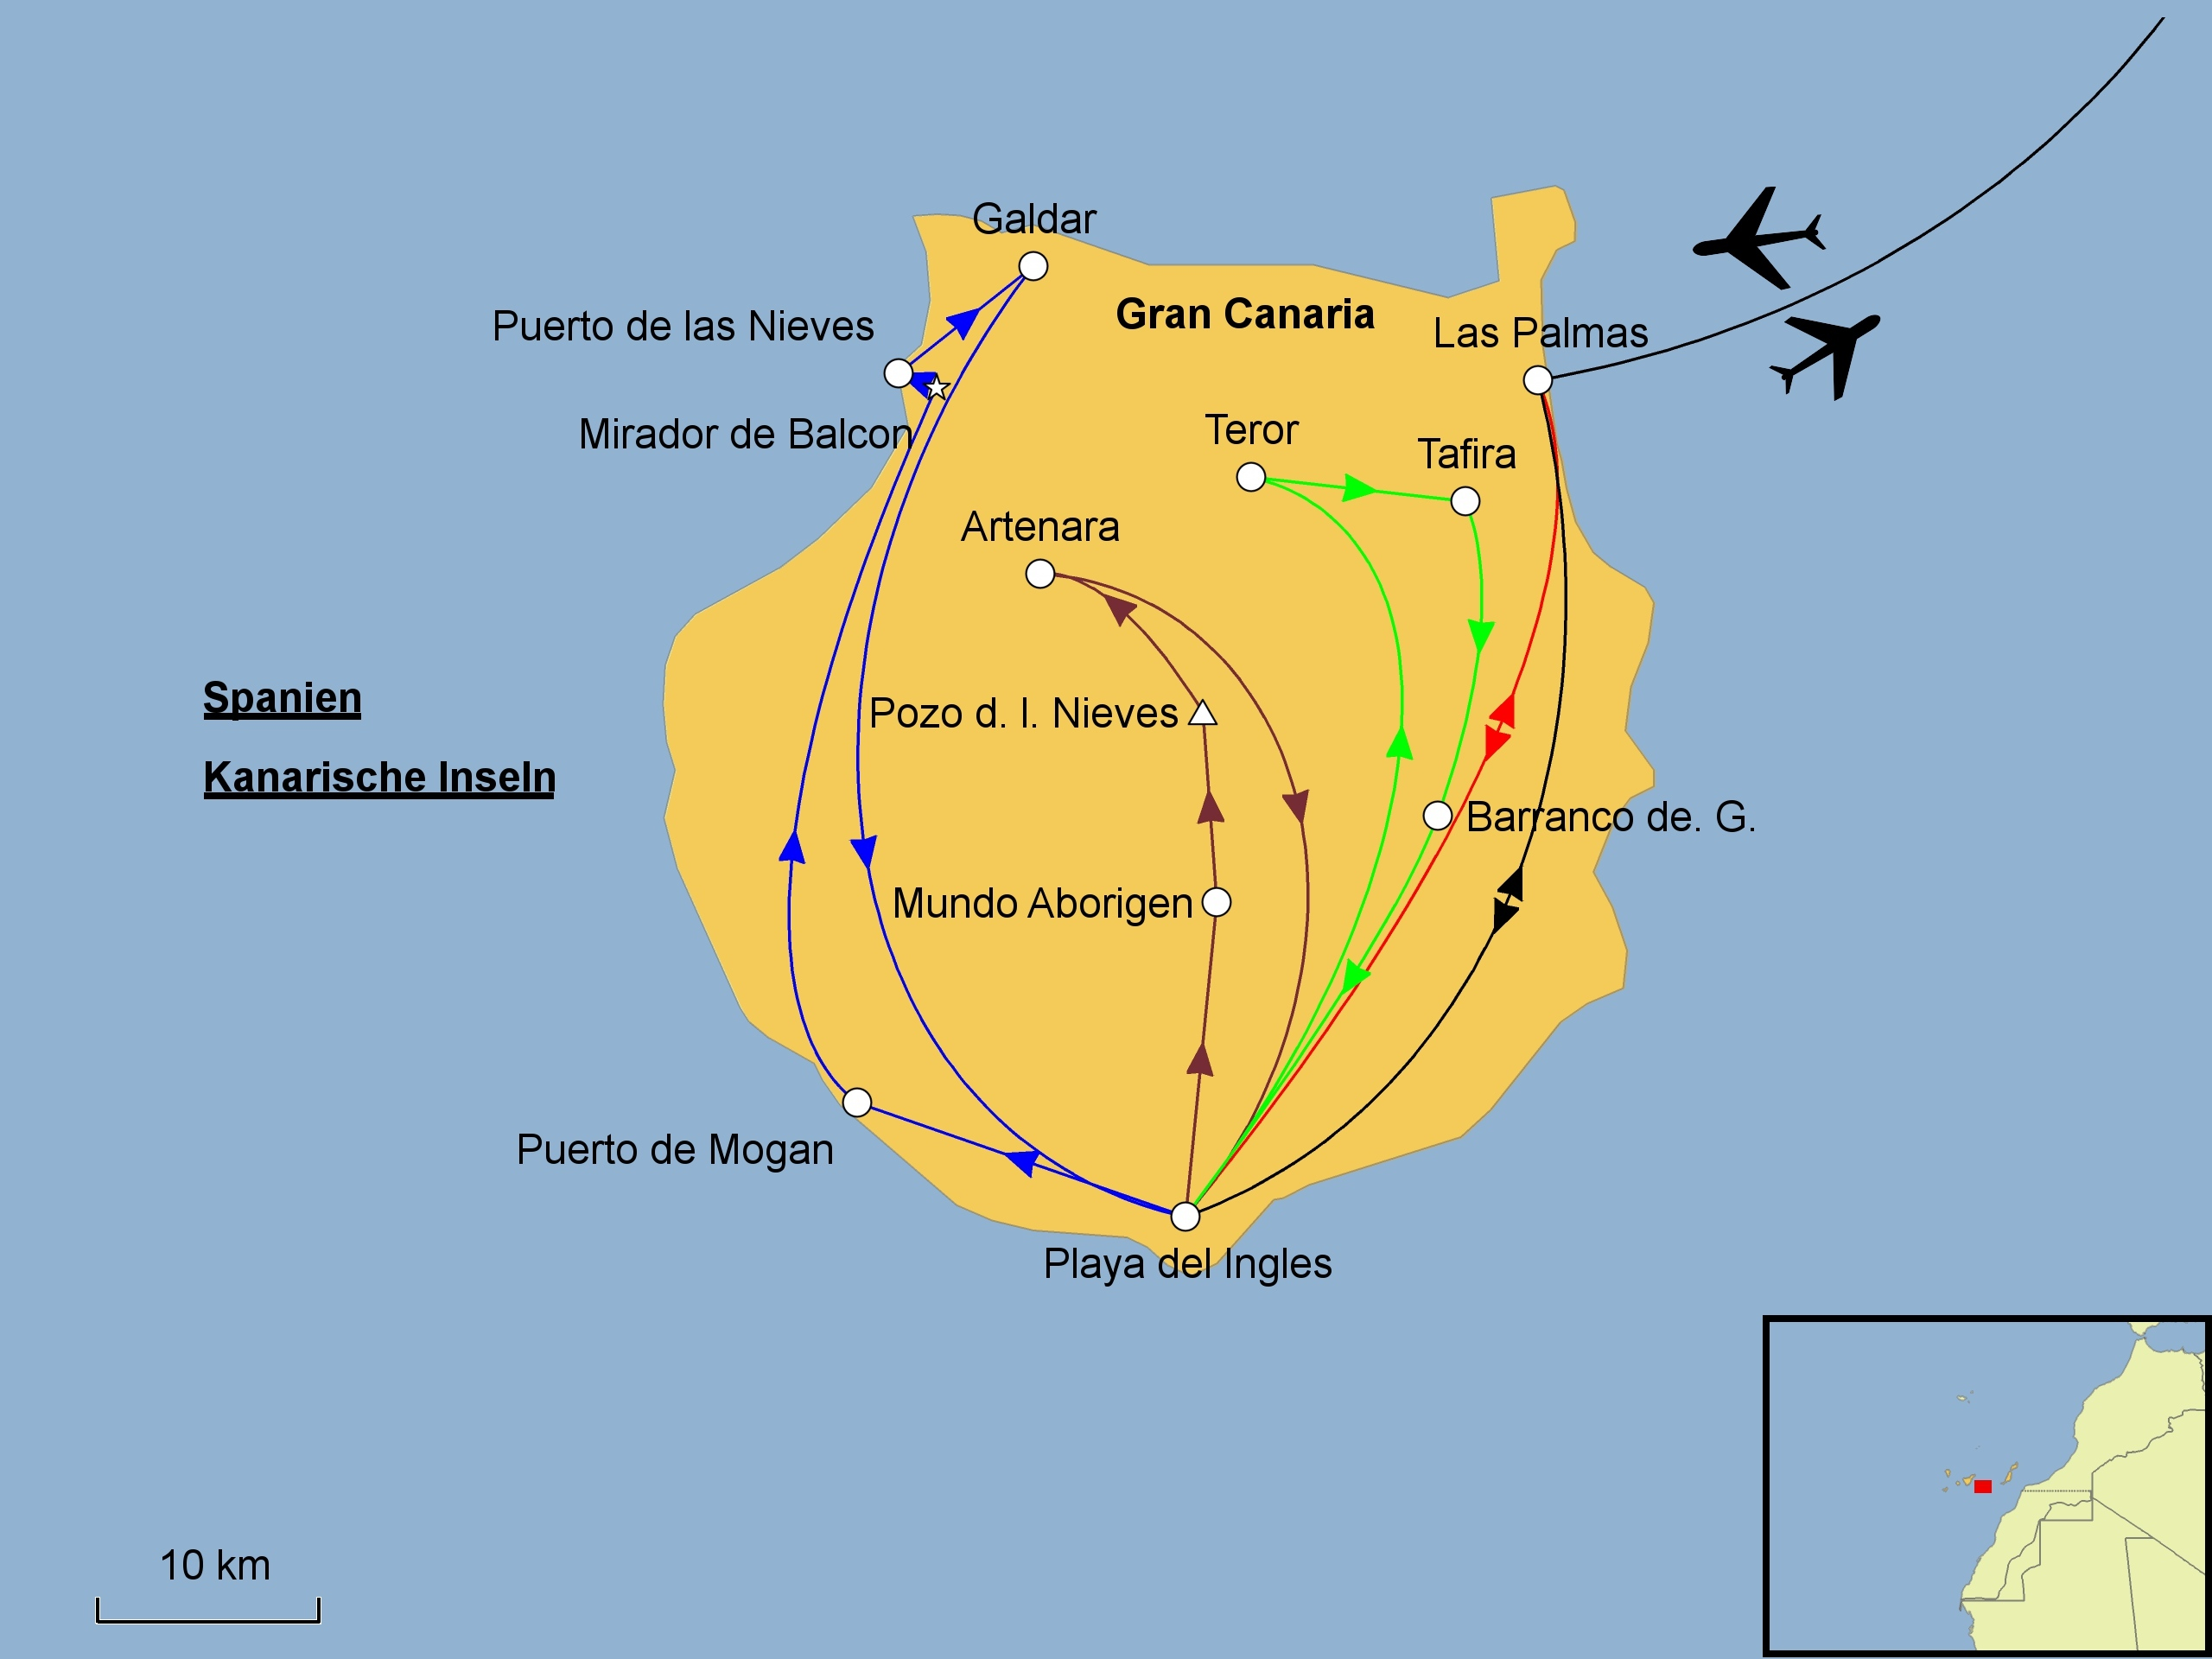 Gran Canaria Karte Flughafen.Gran Canaria Srd Reisen